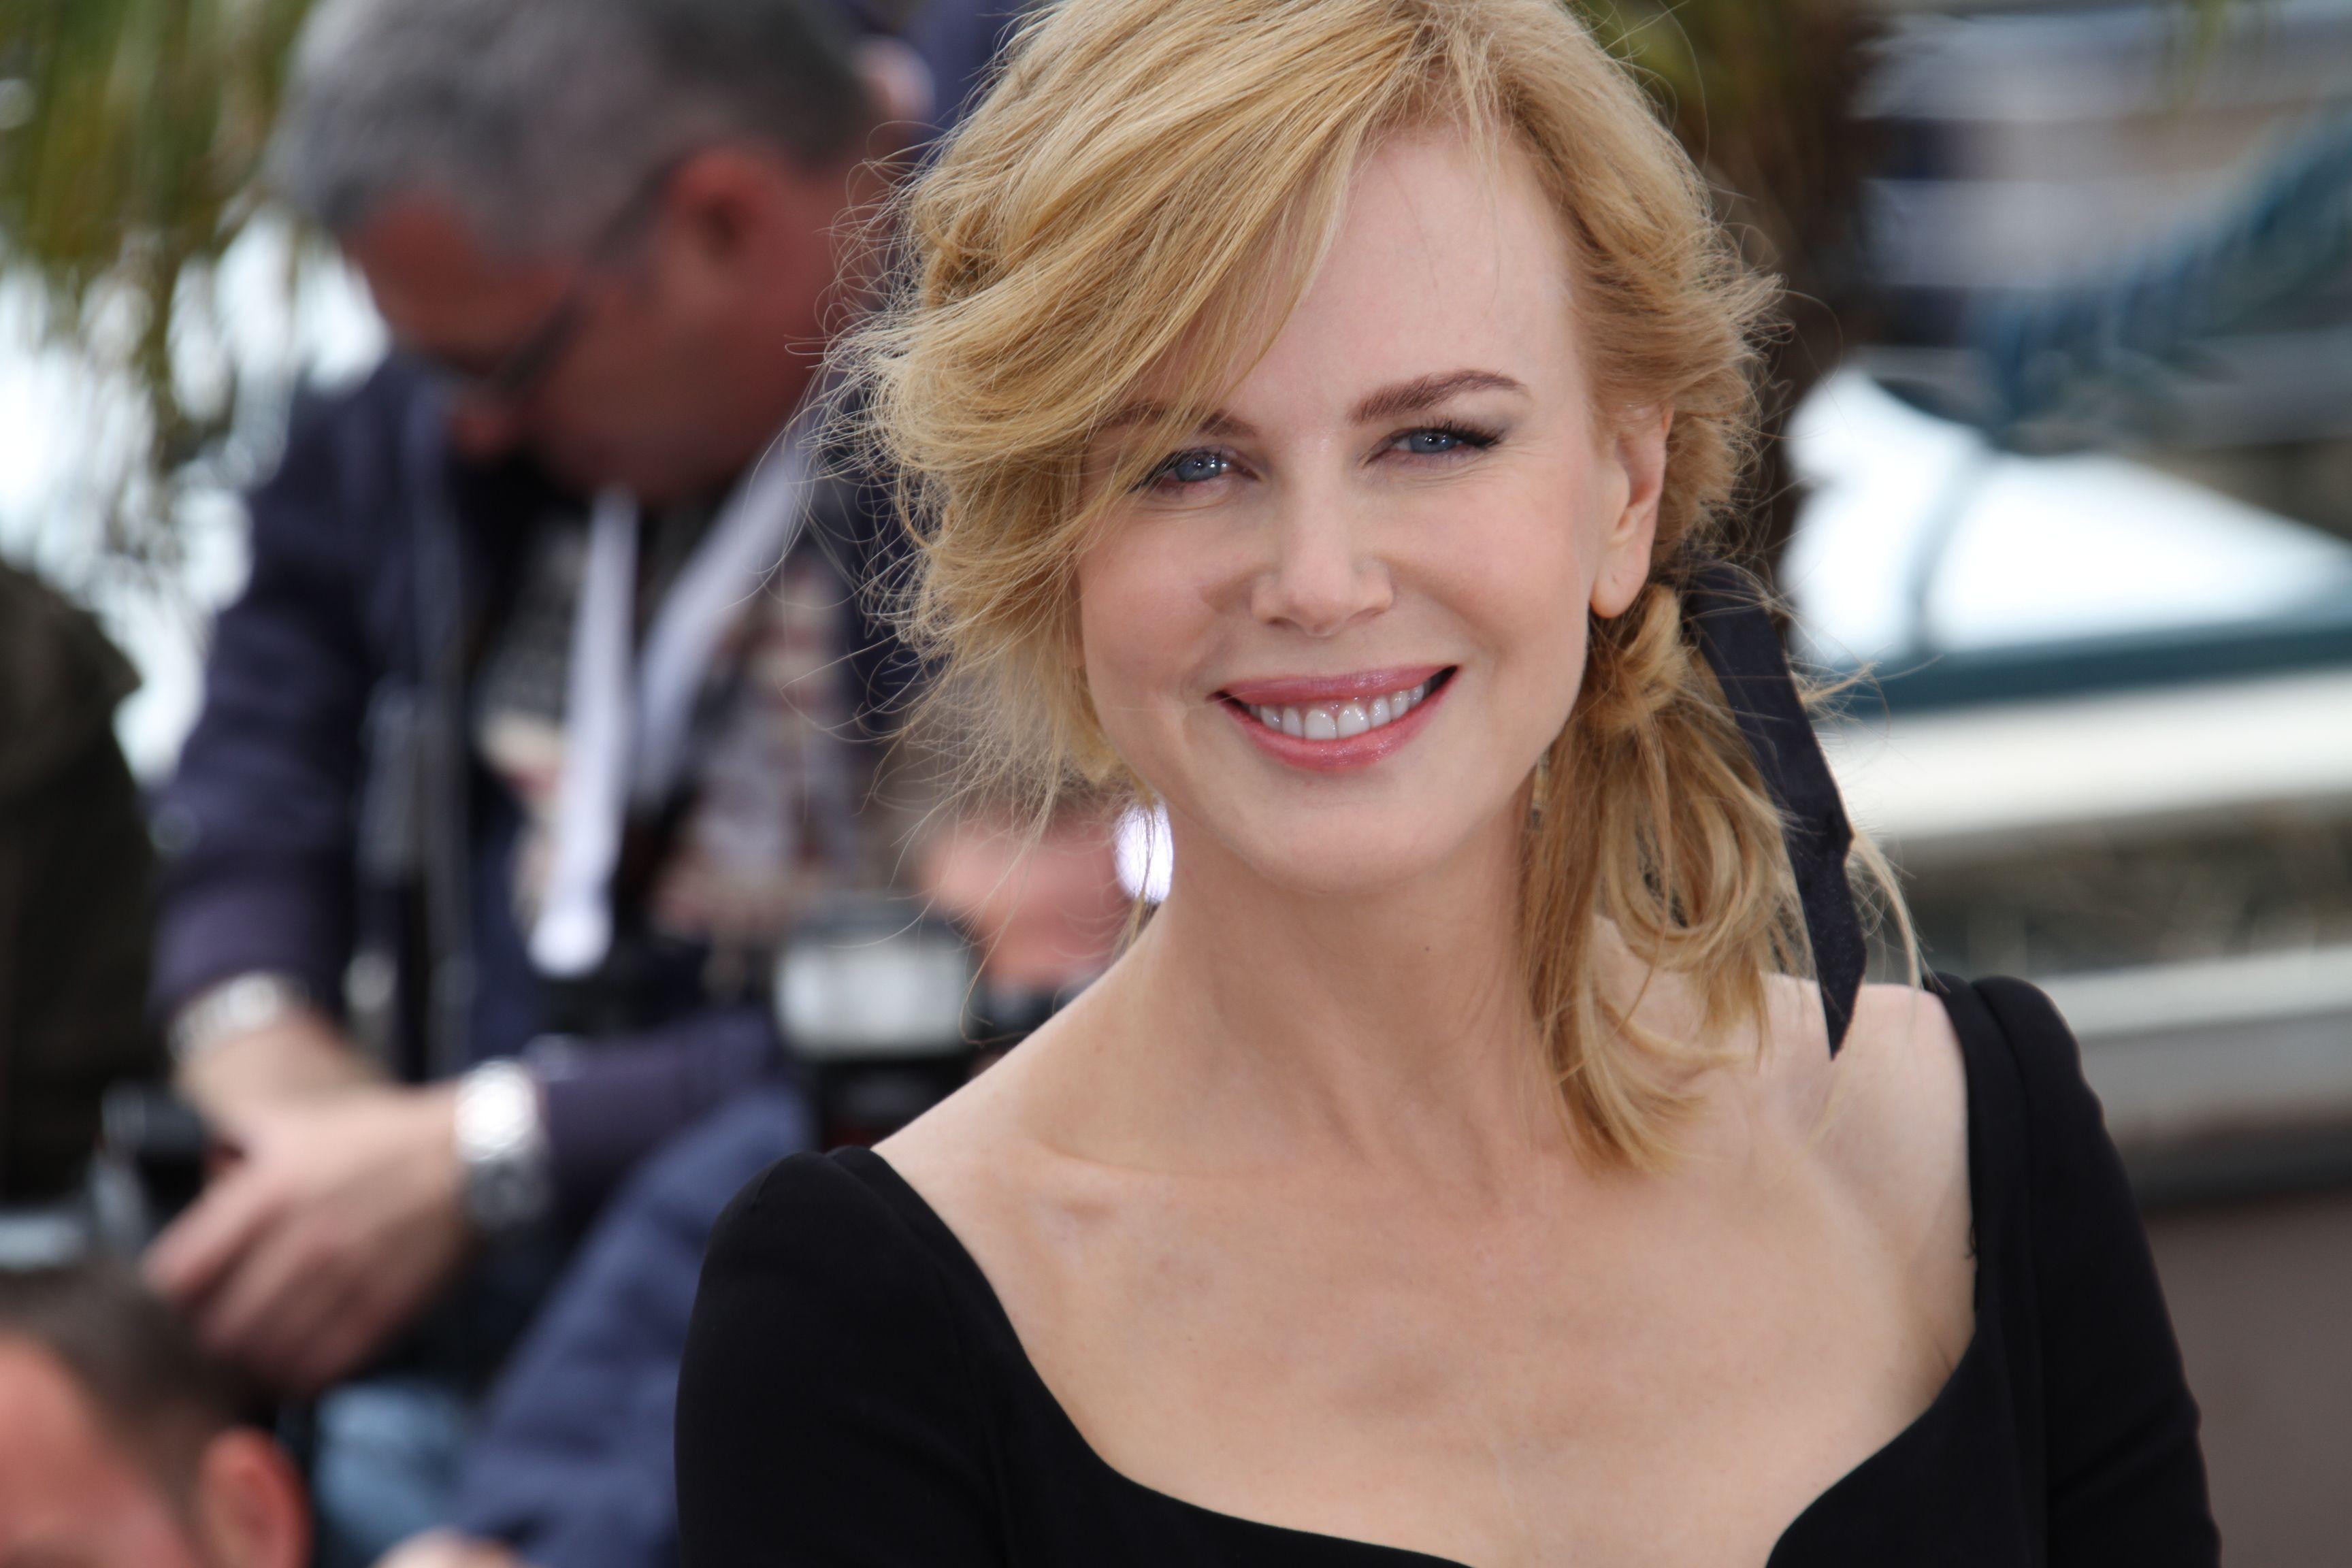 6. Nicole Kidman